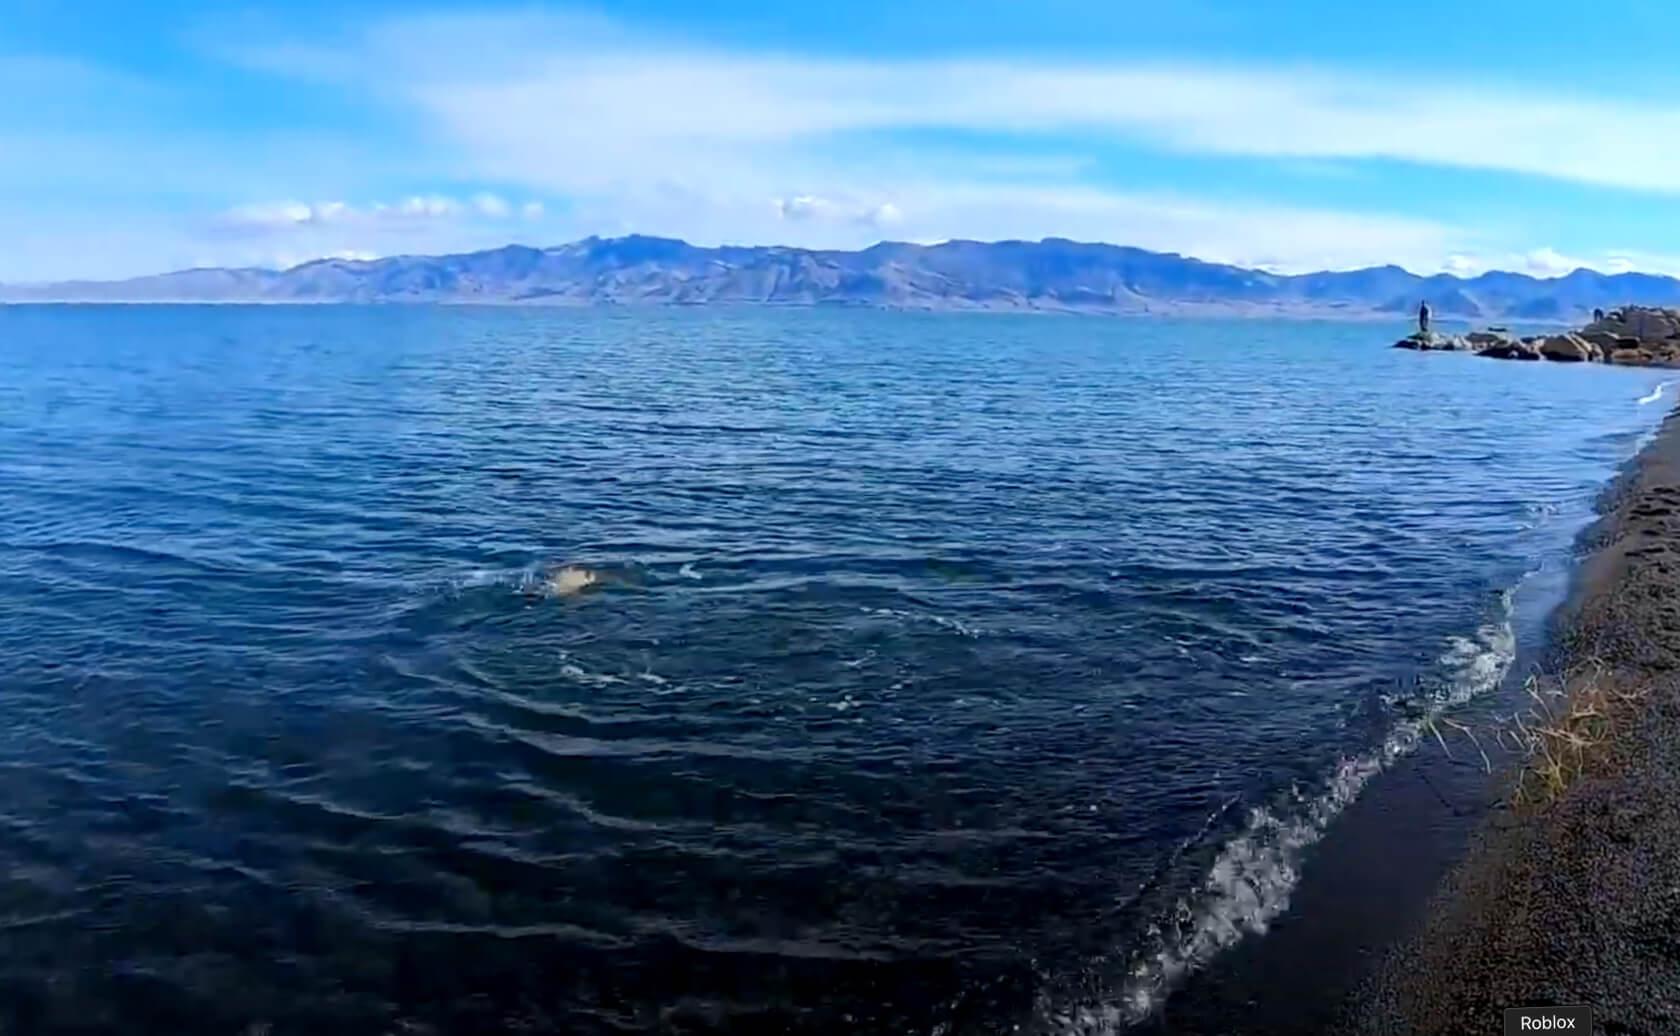 pyramid-lake-fishing-guide-nv-01 copy 3